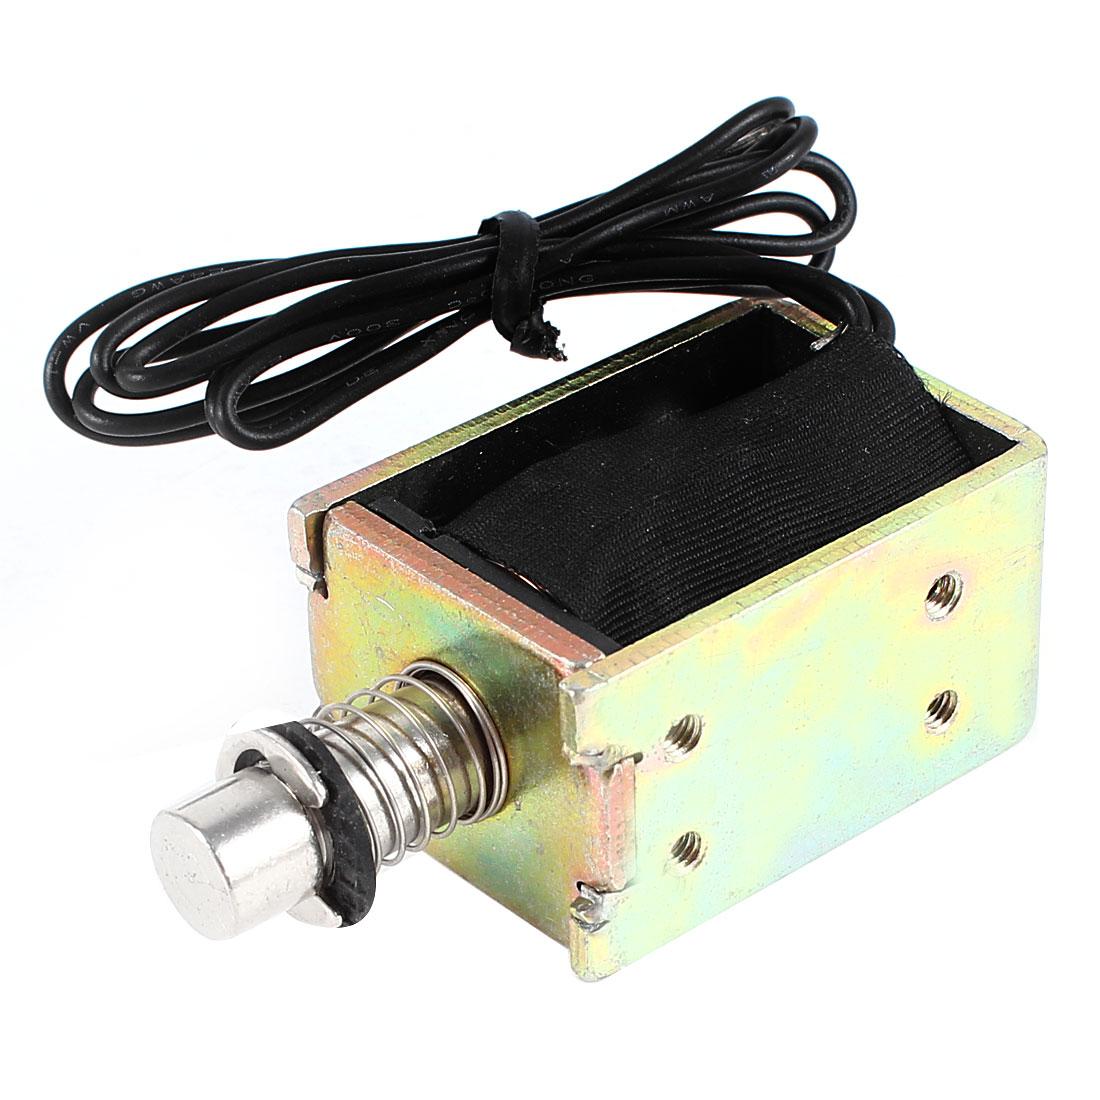 DC 12V 10mm Stroke 2.5LB 1.1Kg Pull Push Type Open Frame Eletric Actuator Solenoid Electromagnet